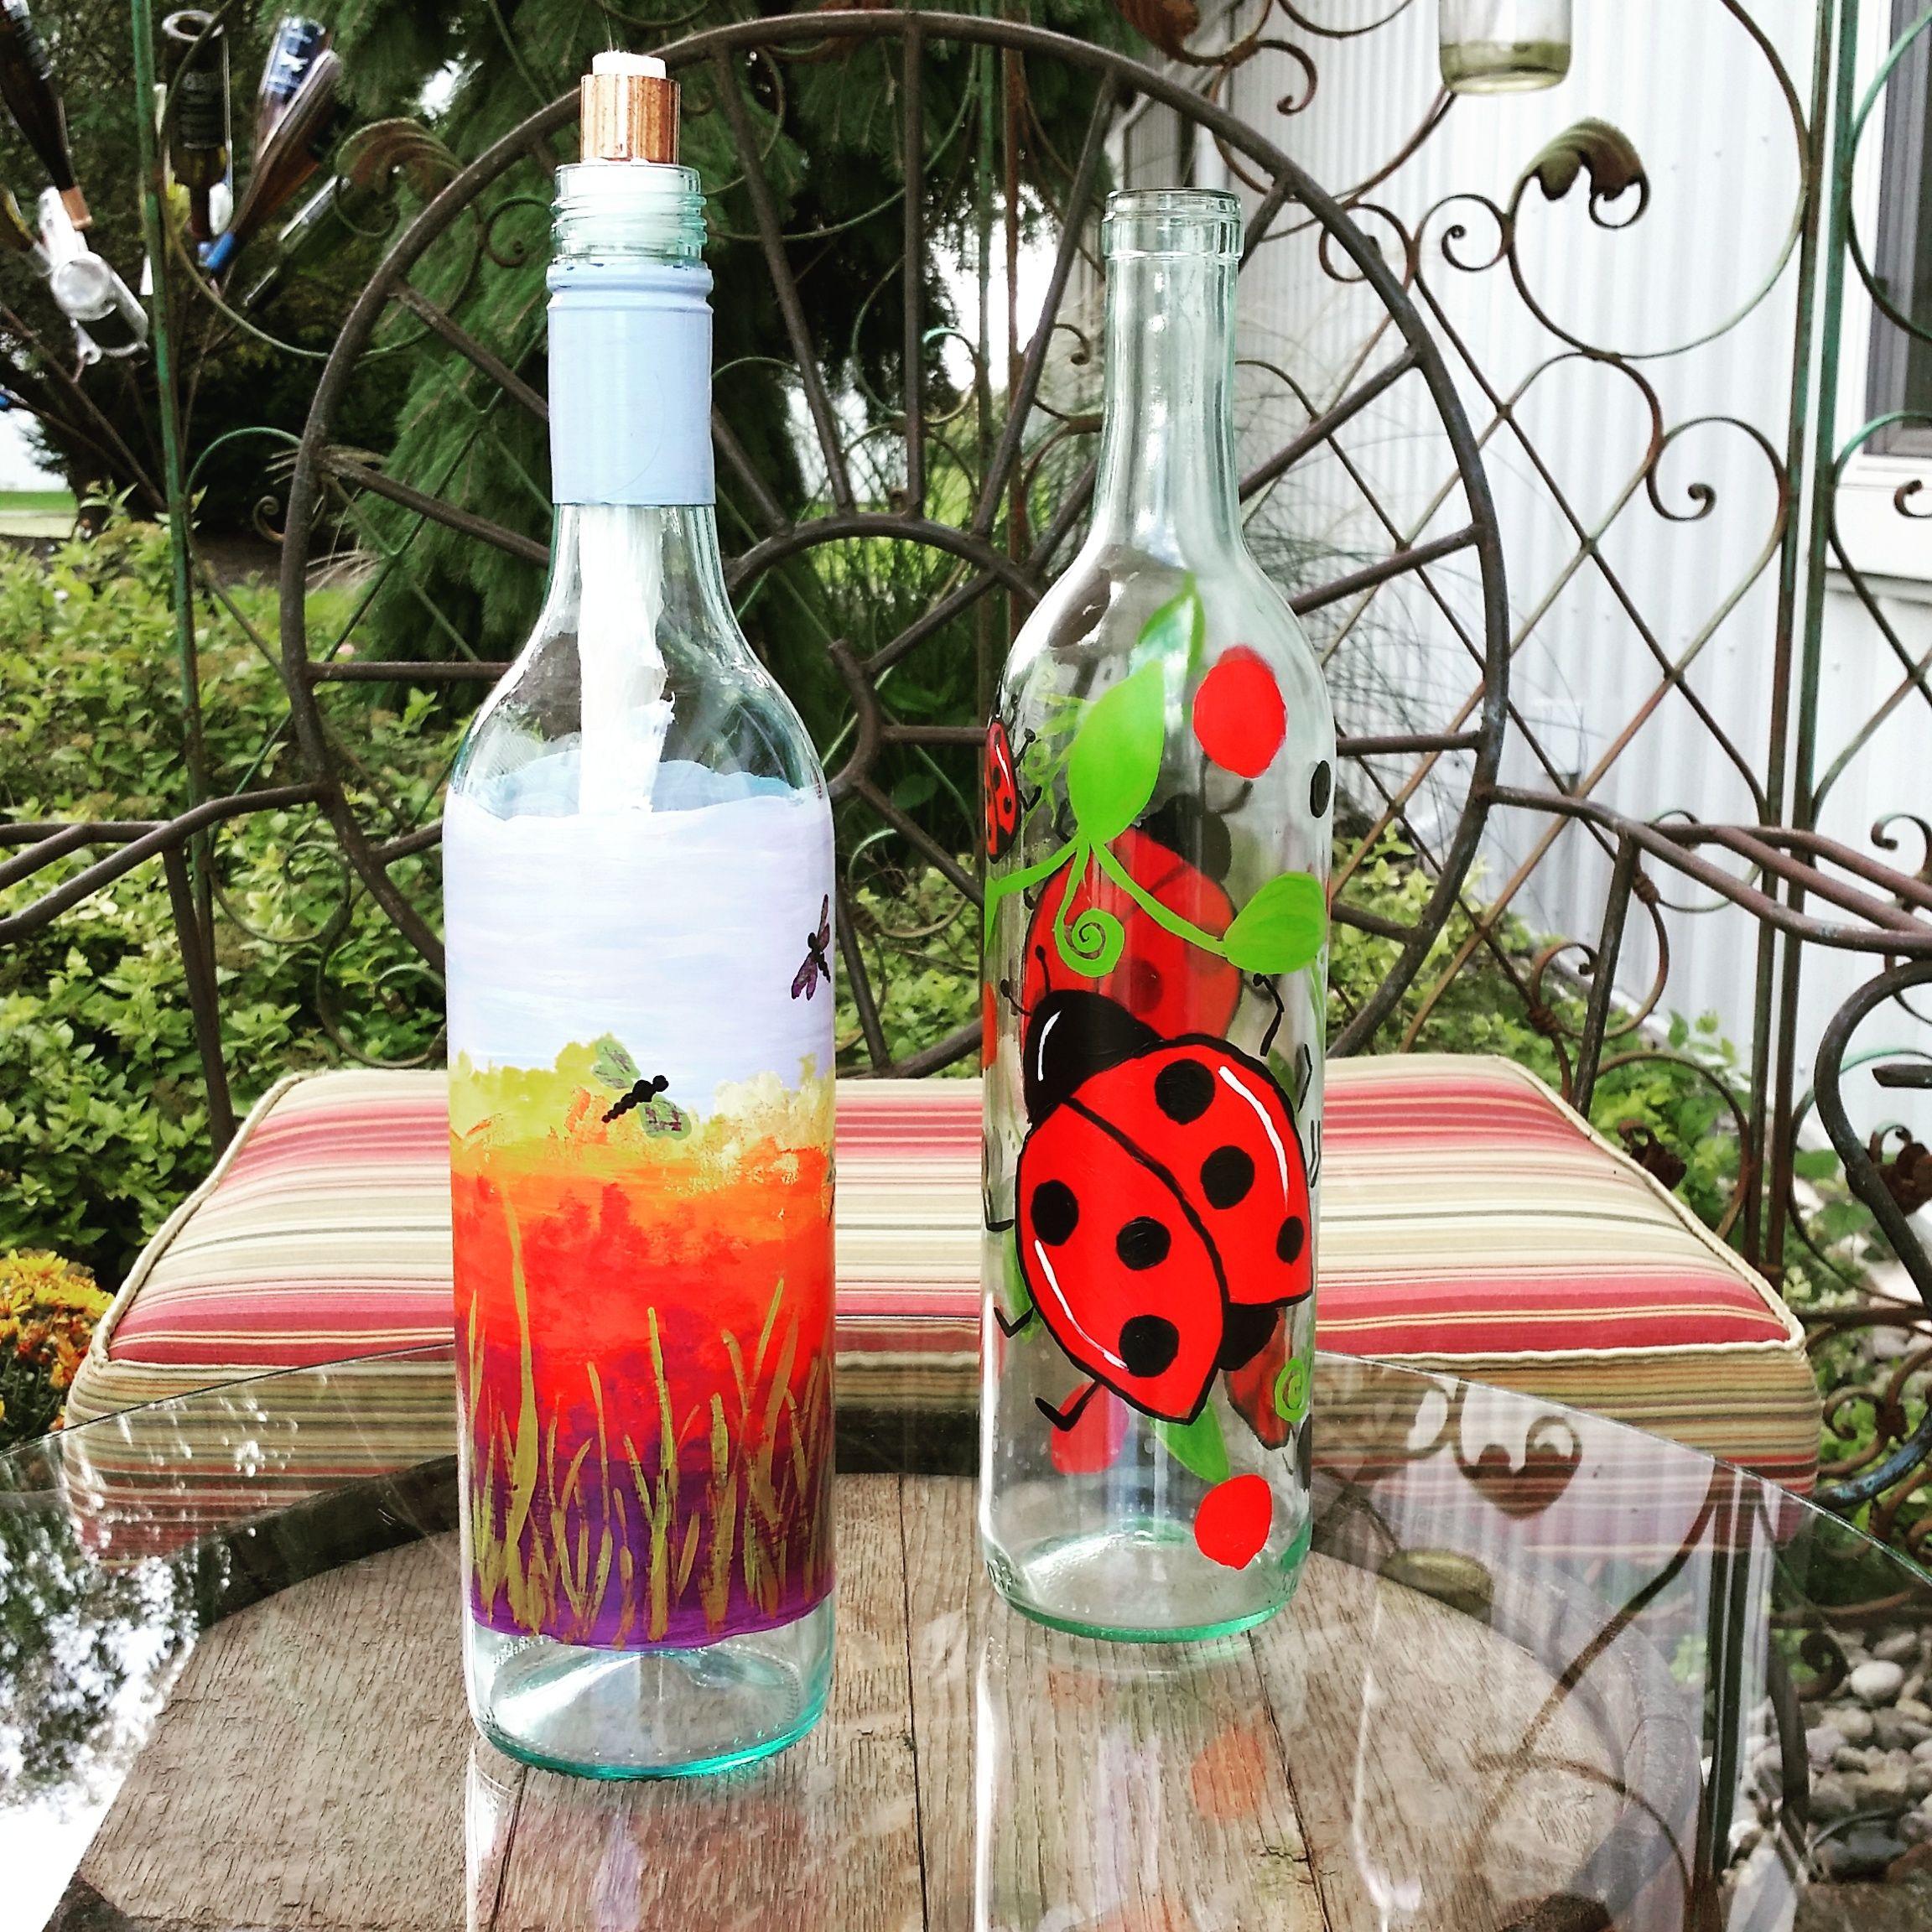 Diy Painted Wine Bottle Tiki Torches Wine Bottle Tiki Torch Painted Wine Bottles Recycled Wine Bottles